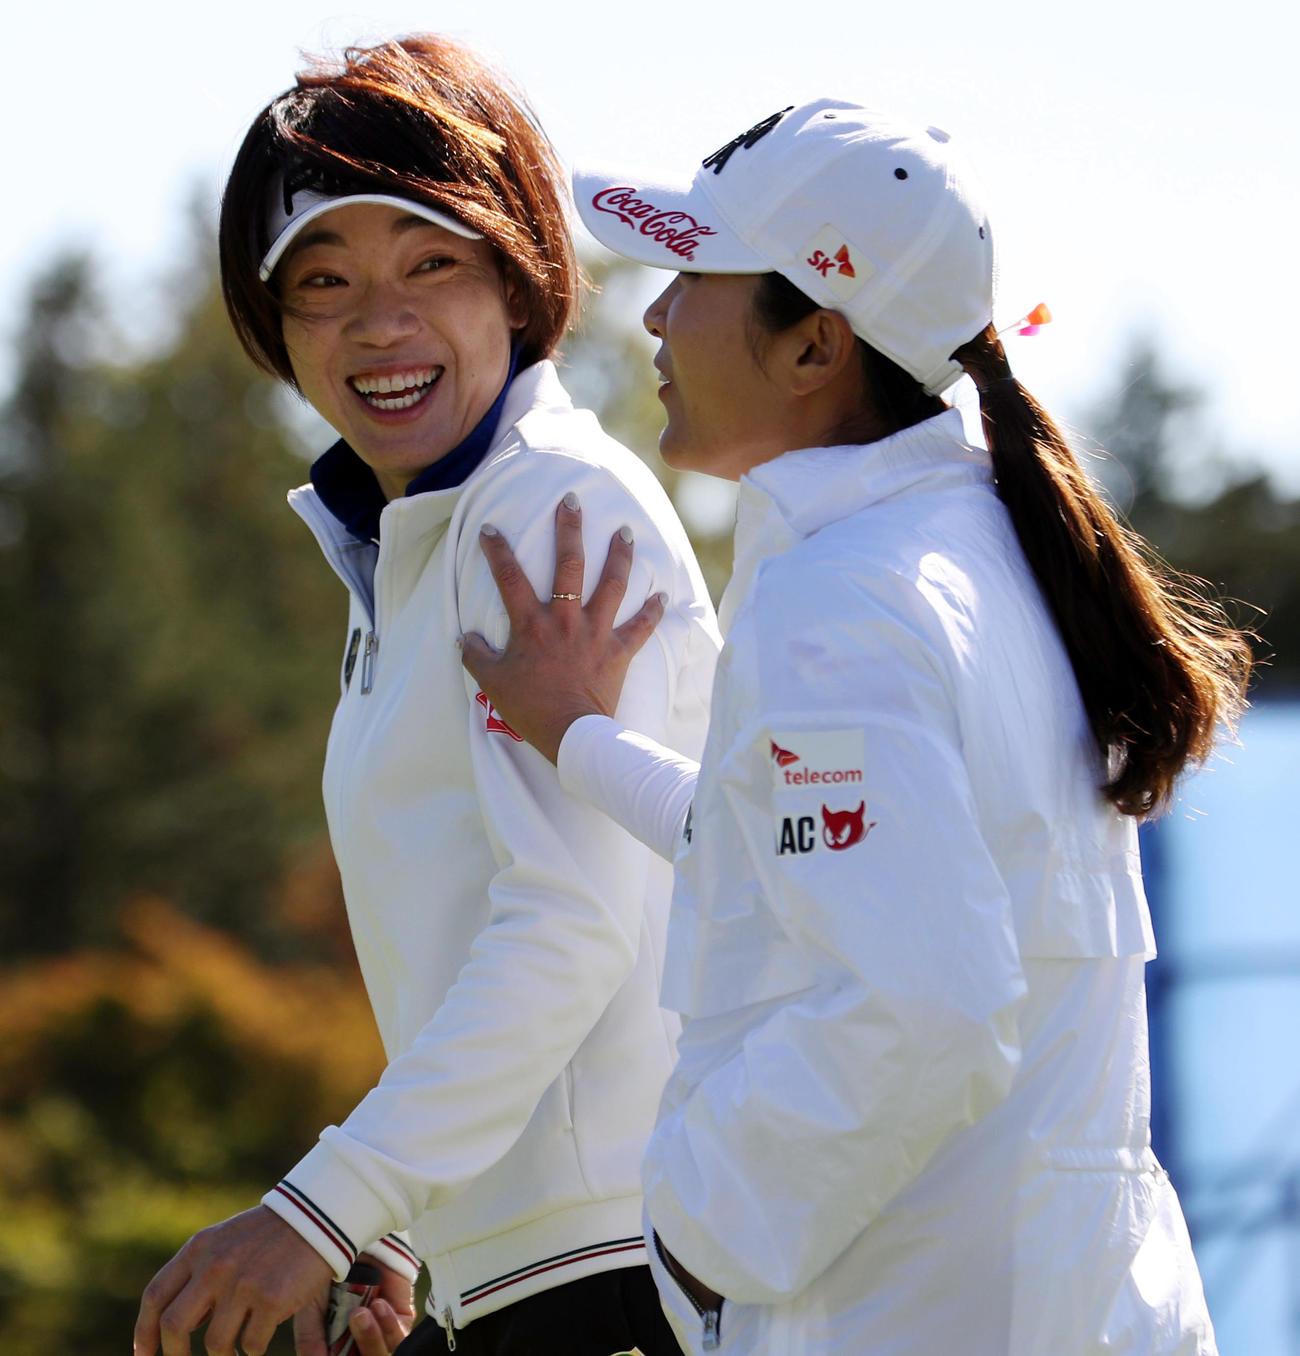 https://www.nikkansports.com/sports/golf/news/img/202011040000186-w1300_14.jpg